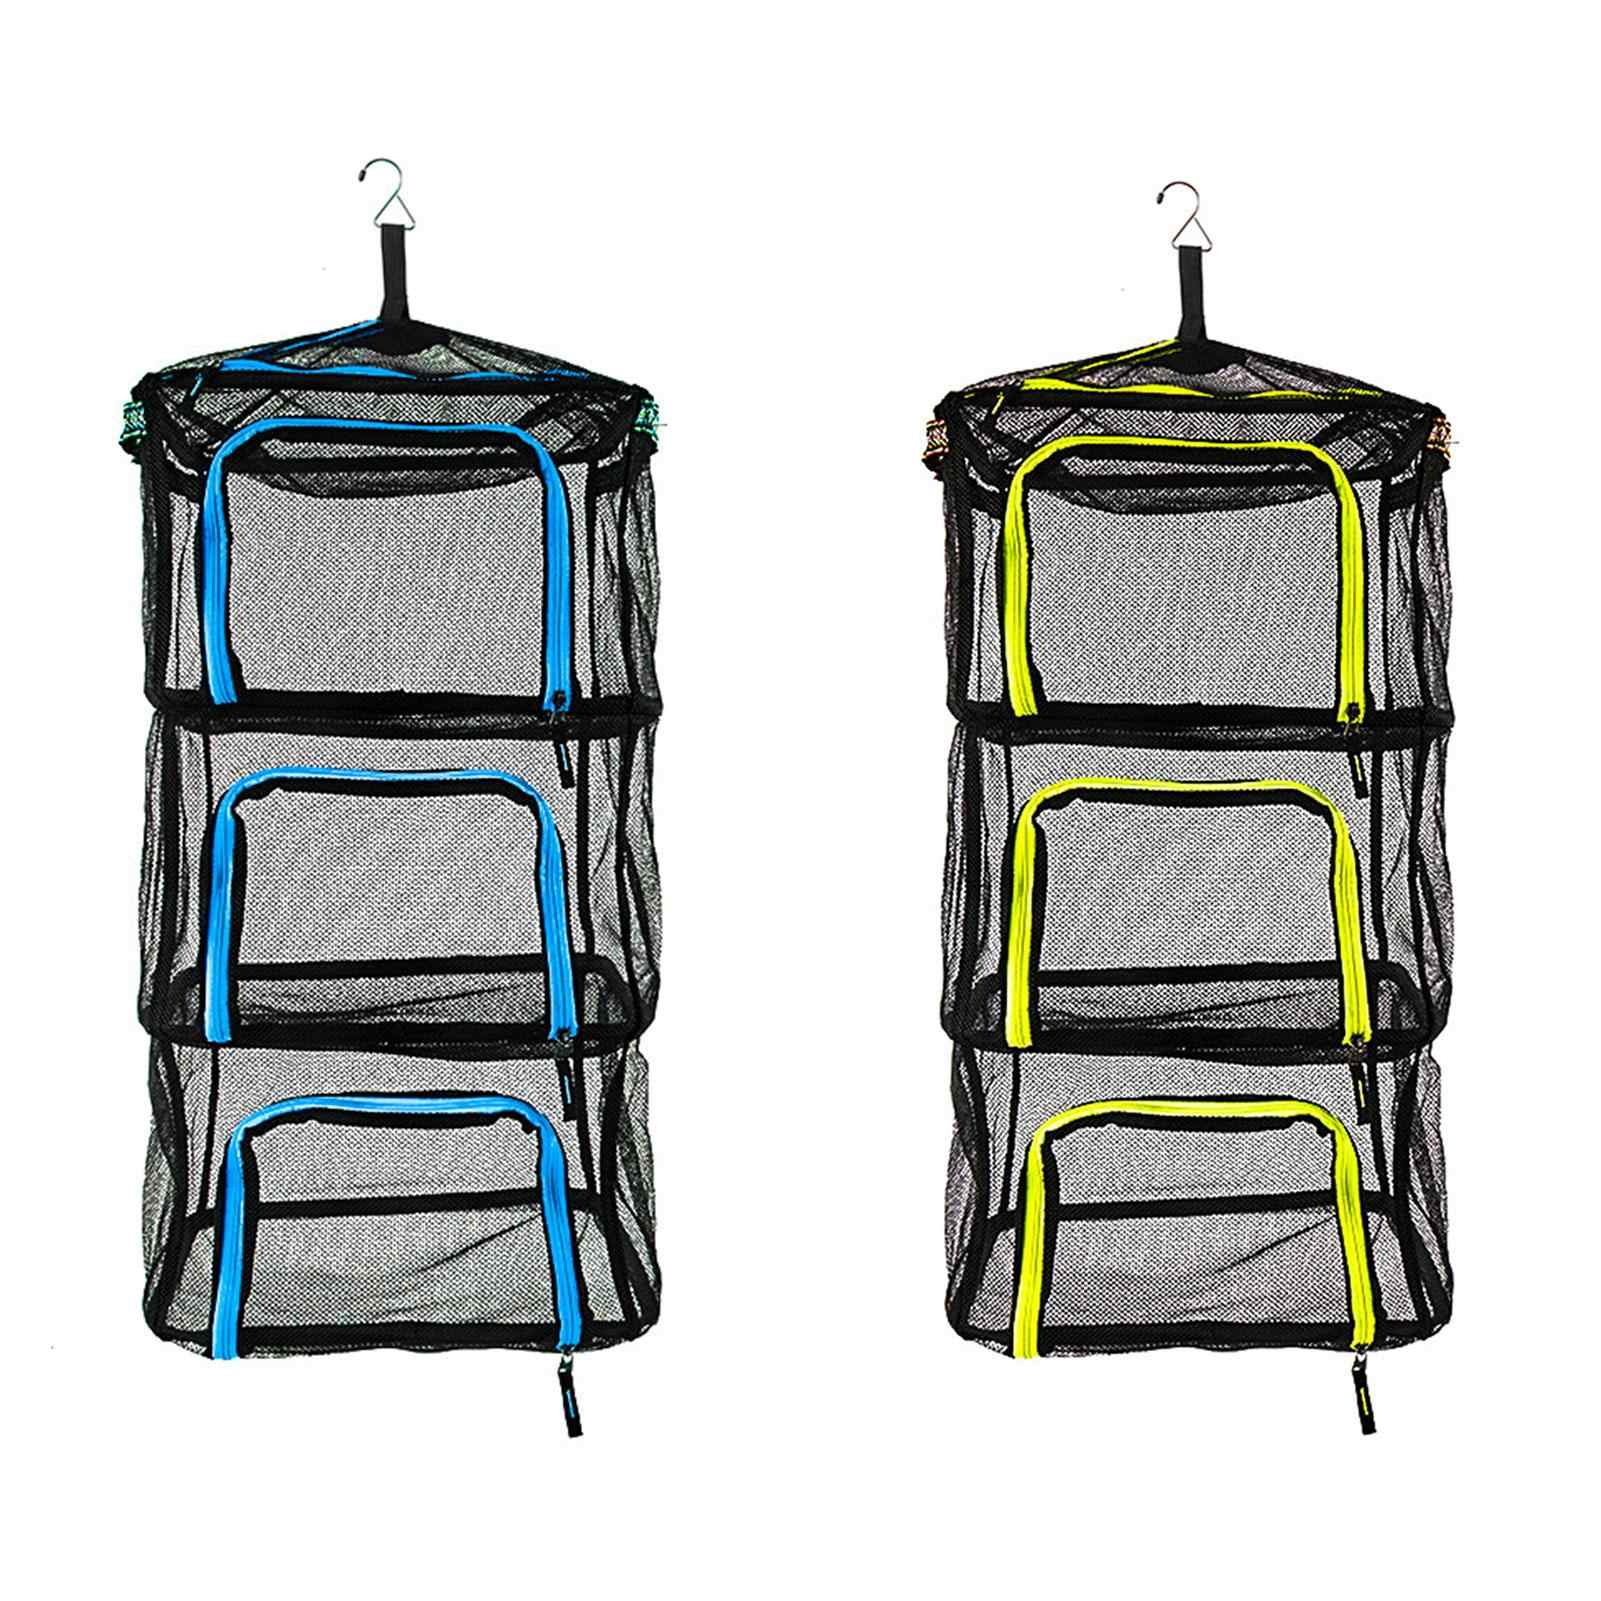 QHYXT Red de Secado de Camping Malla Colgante Al Aire Libre Tendedero Plegable Organizador de Almacenamiento Multiprop/ósito para Picnic//Barbacoa//Vajilla//Platos//Comida//Verduras//Fruta//Ropa